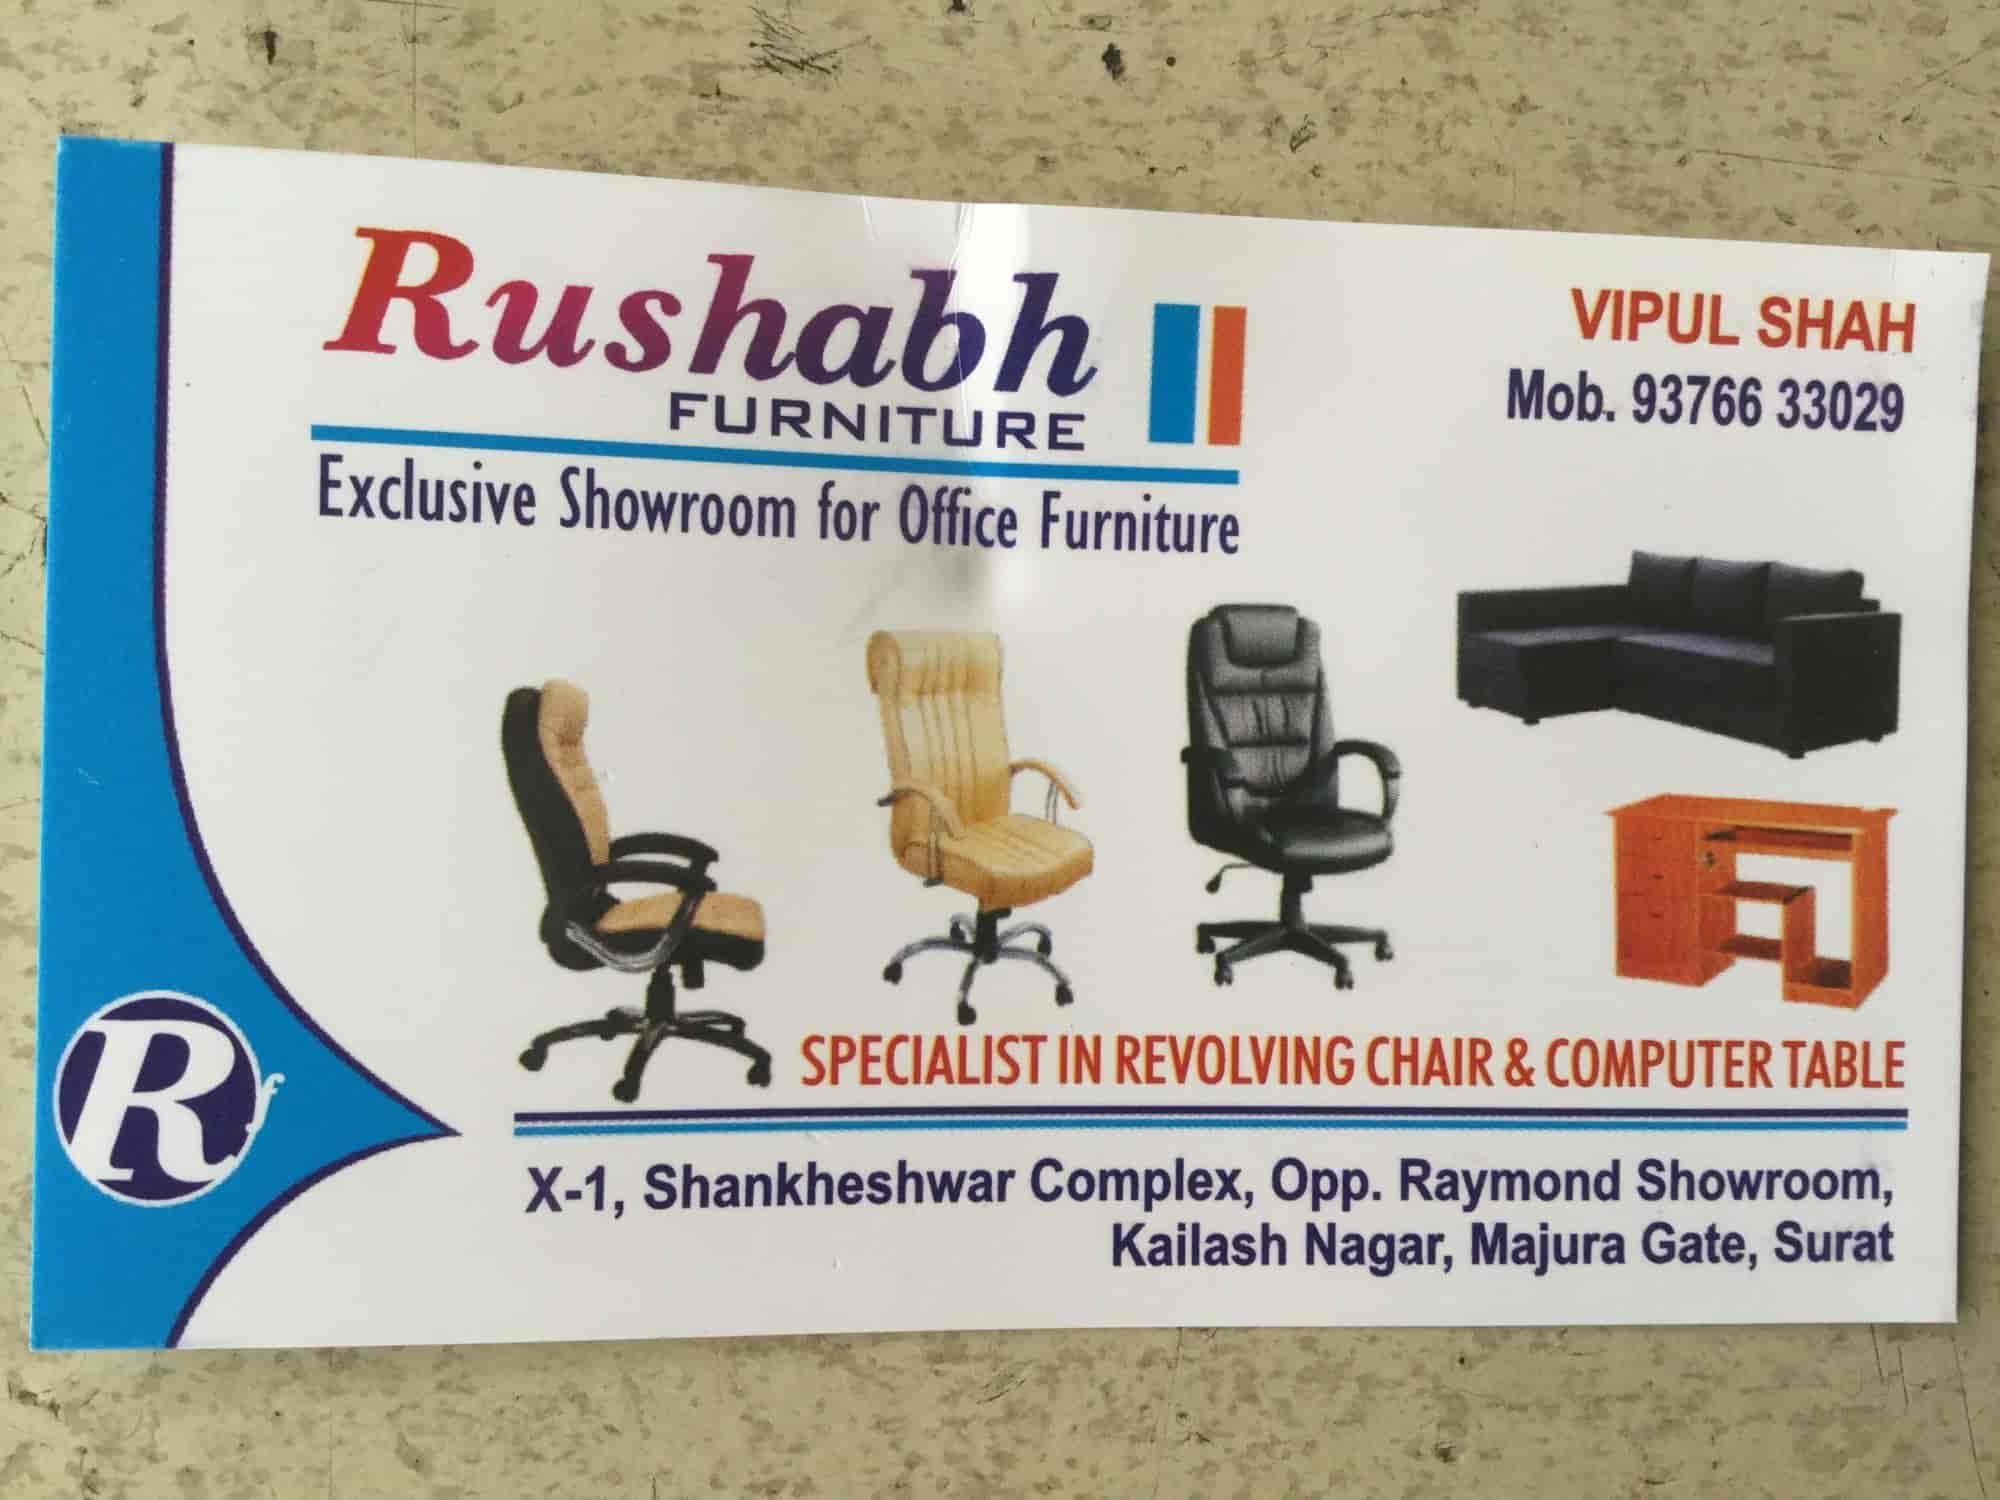 Rushabh Furniture, Kailash Nagar   Rishabh Furniture   Furniture  Manufacturers In Surat   Justdial